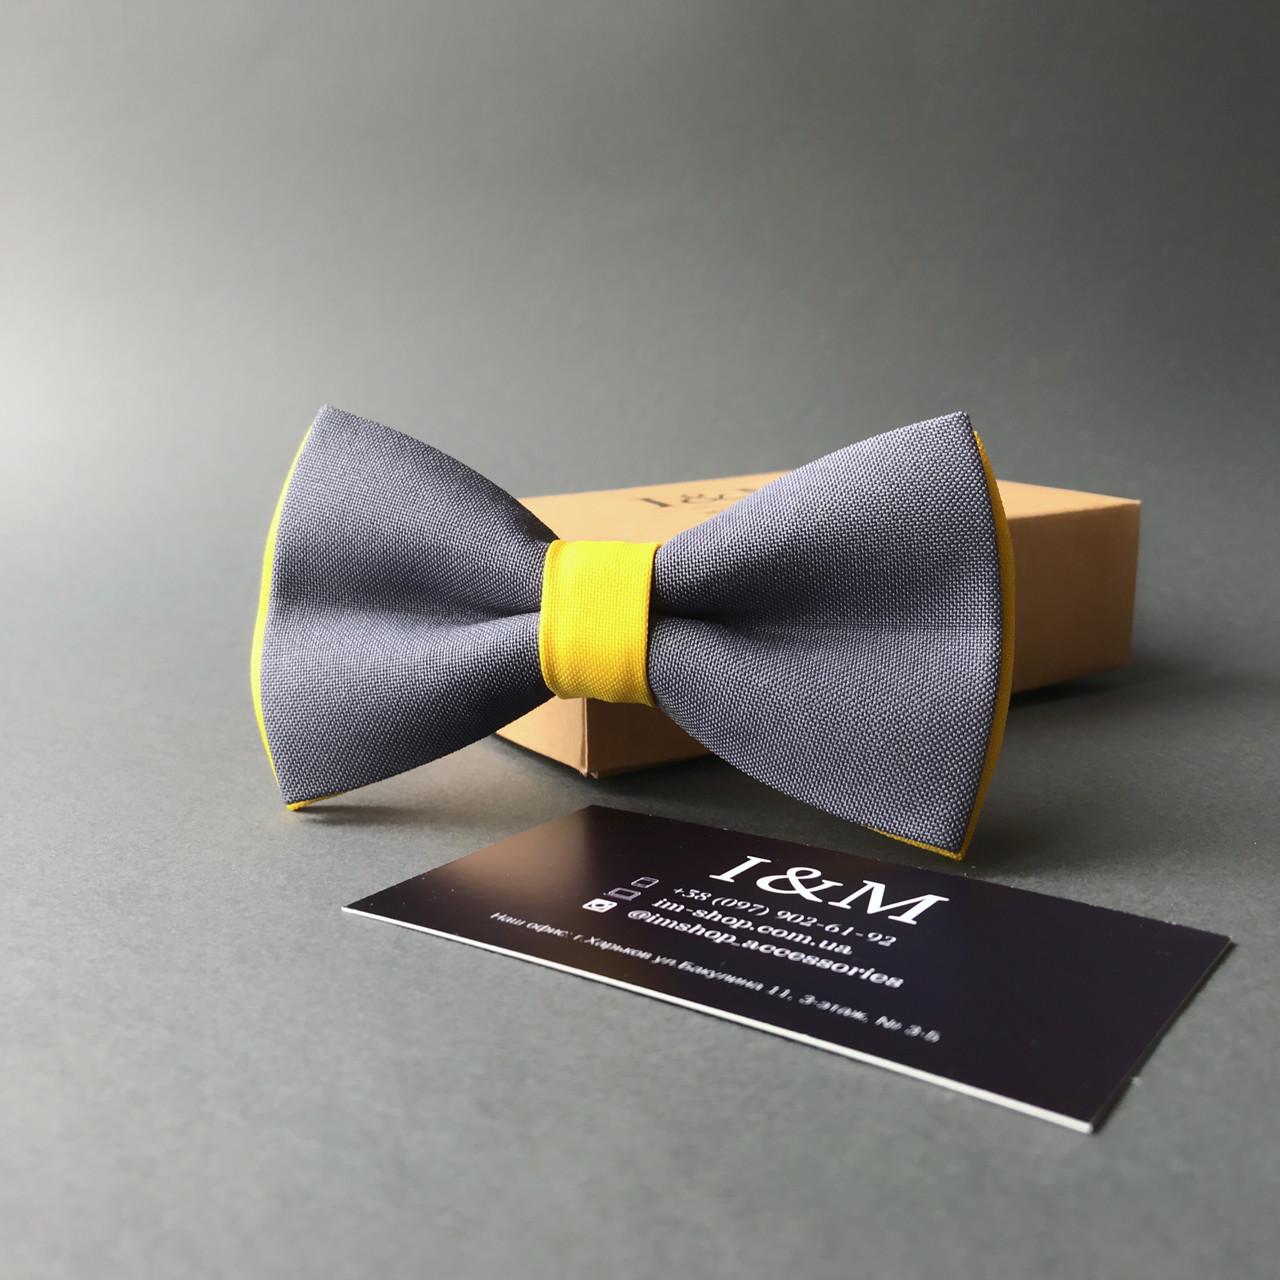 Галстук-бабочка I&M Craft двухцветный серый с желтым (010617)